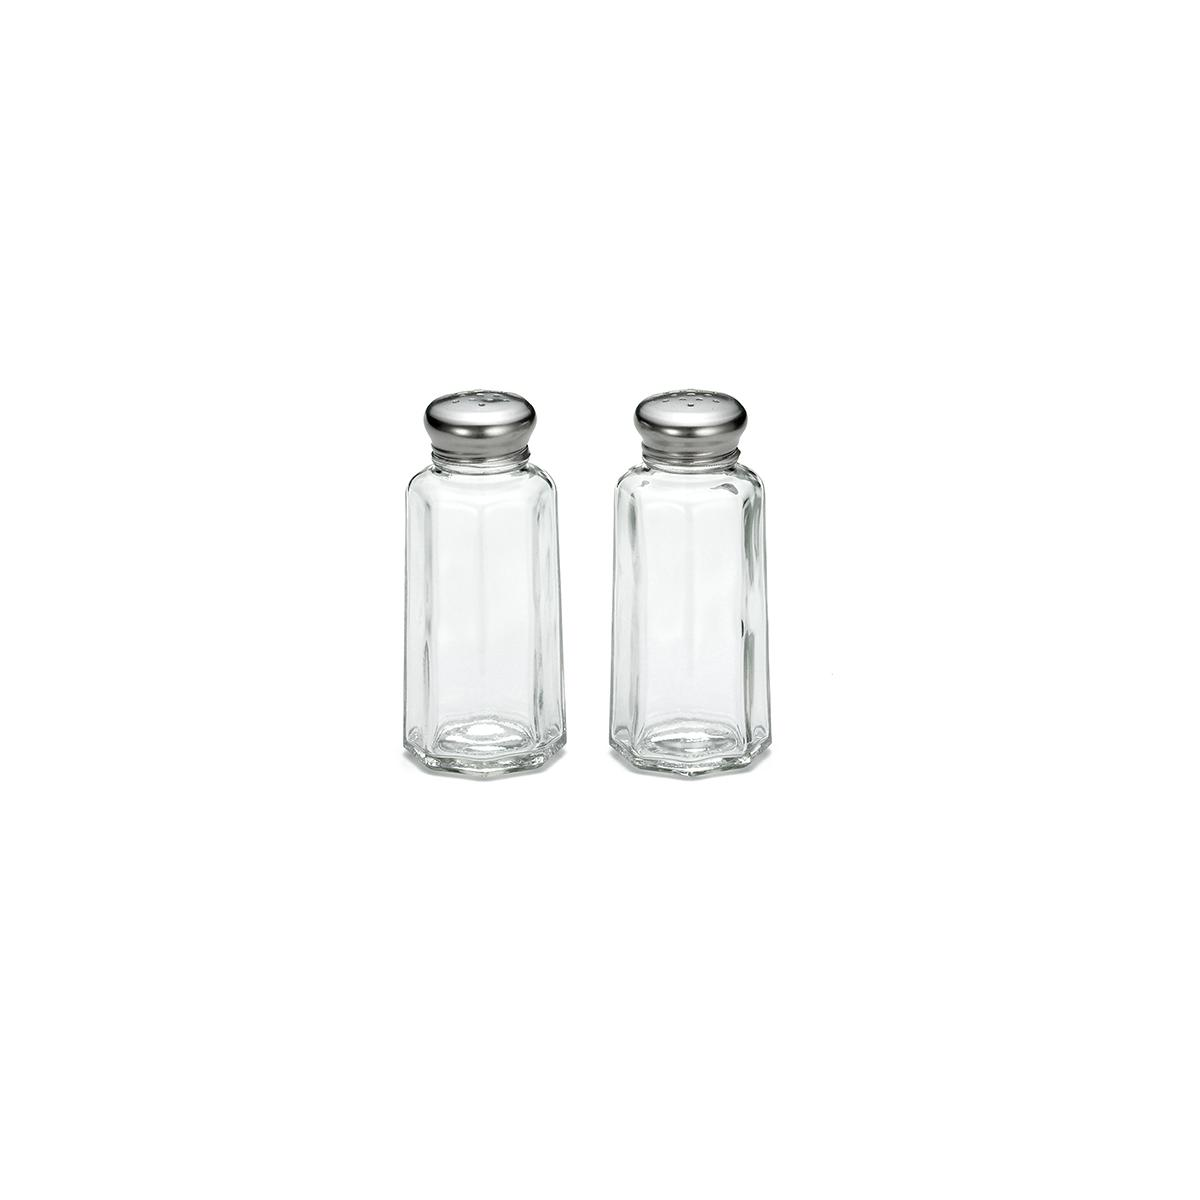 Panelled Salt Pepper Shaker Set With Stainless Steel Tops 60ml